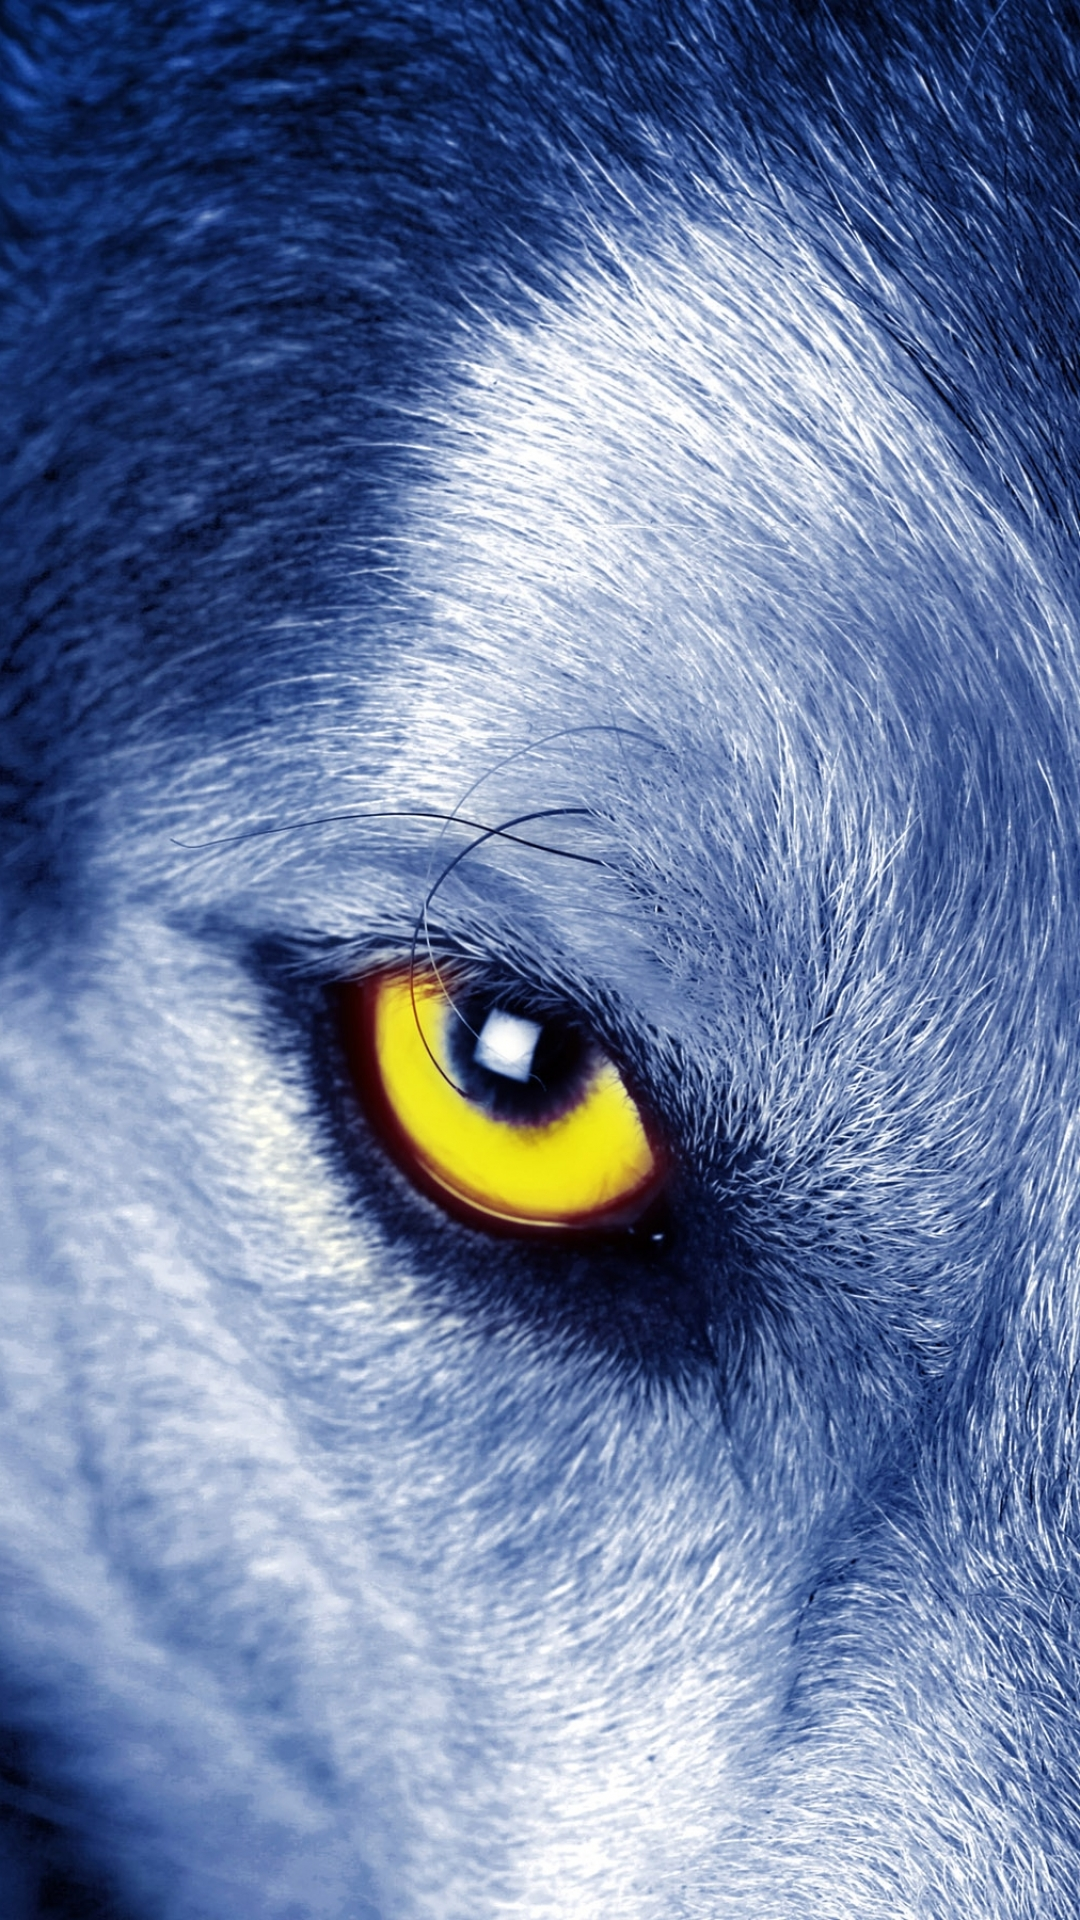 Wolf Eyes Wallpaper Iphone 1080x1920 Wallpaper Teahub Io